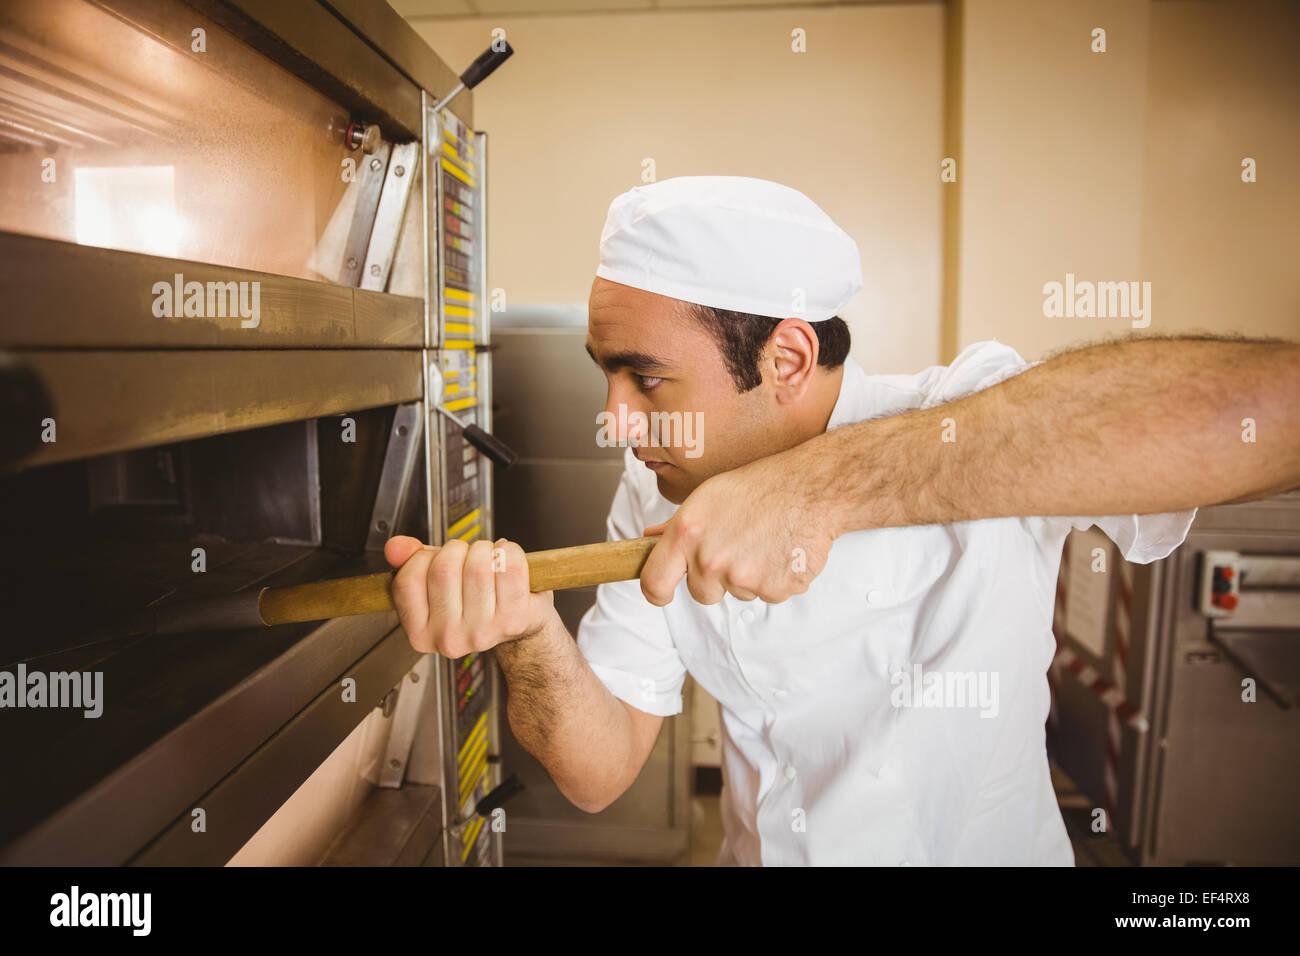 Baker teniendo pan del horno Imagen De Stock